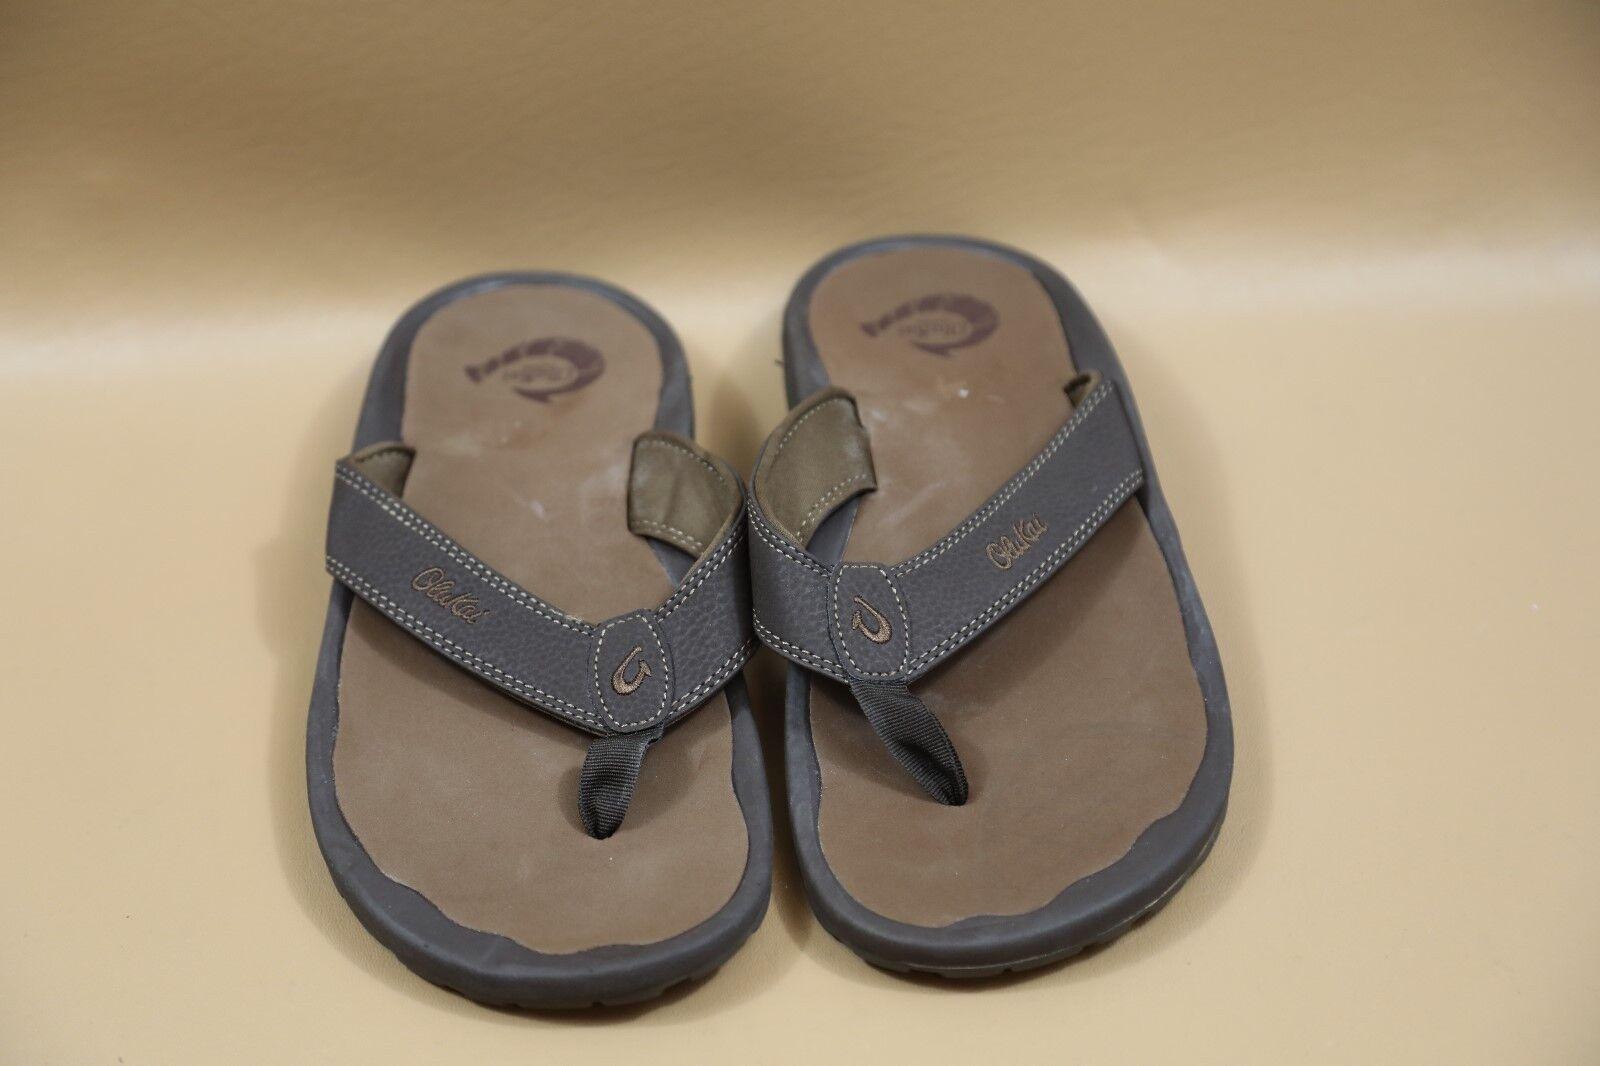 82 OluKai 'Ohana' Flip Flop Mens' Size 10-43